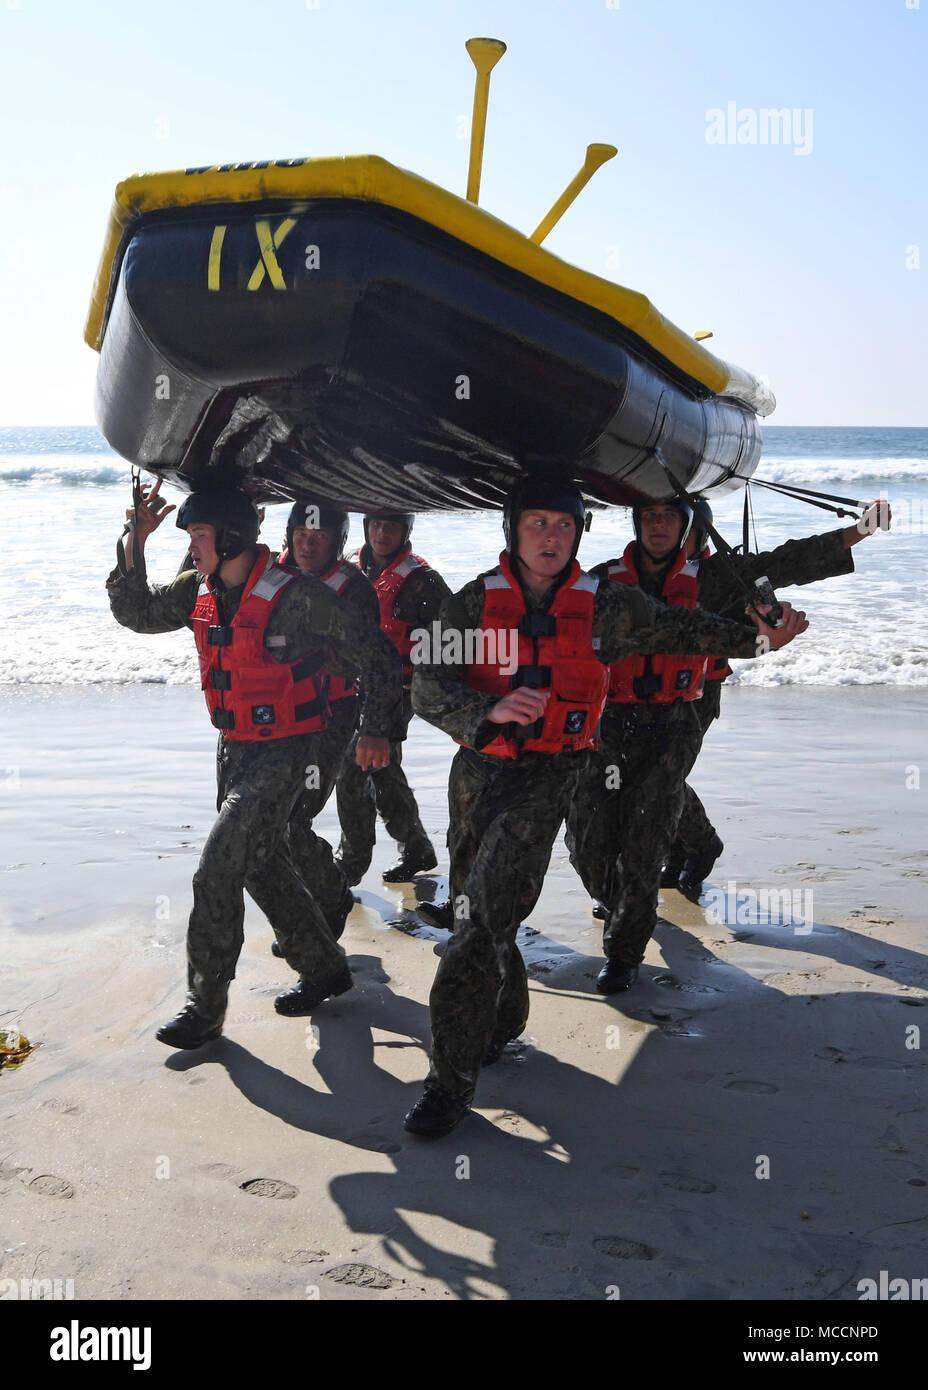 Navy Seal Amphibious Training Stock Photos & Navy Seal